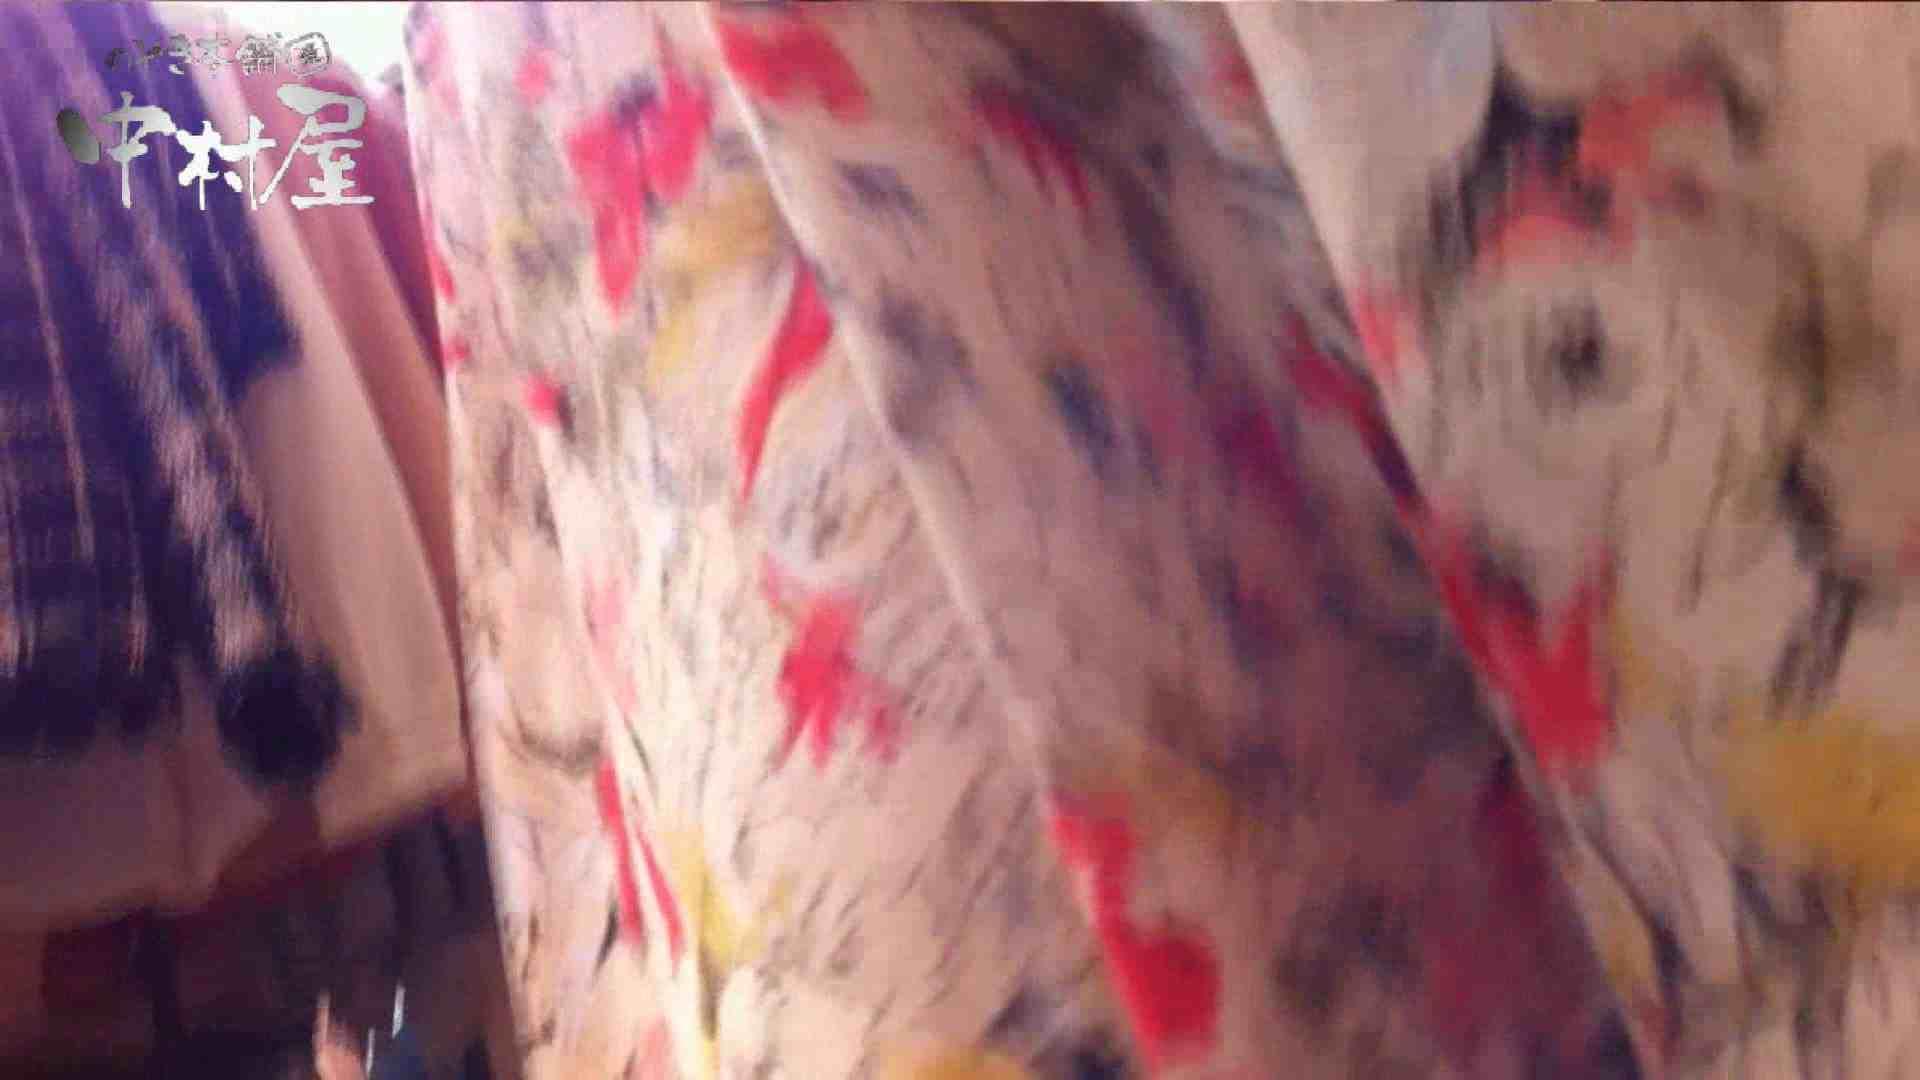 vol.57 美人アパレル胸チラ&パンチラ 激カワ店員のおっぱい 胸チラ ワレメ動画紹介 99pic 89